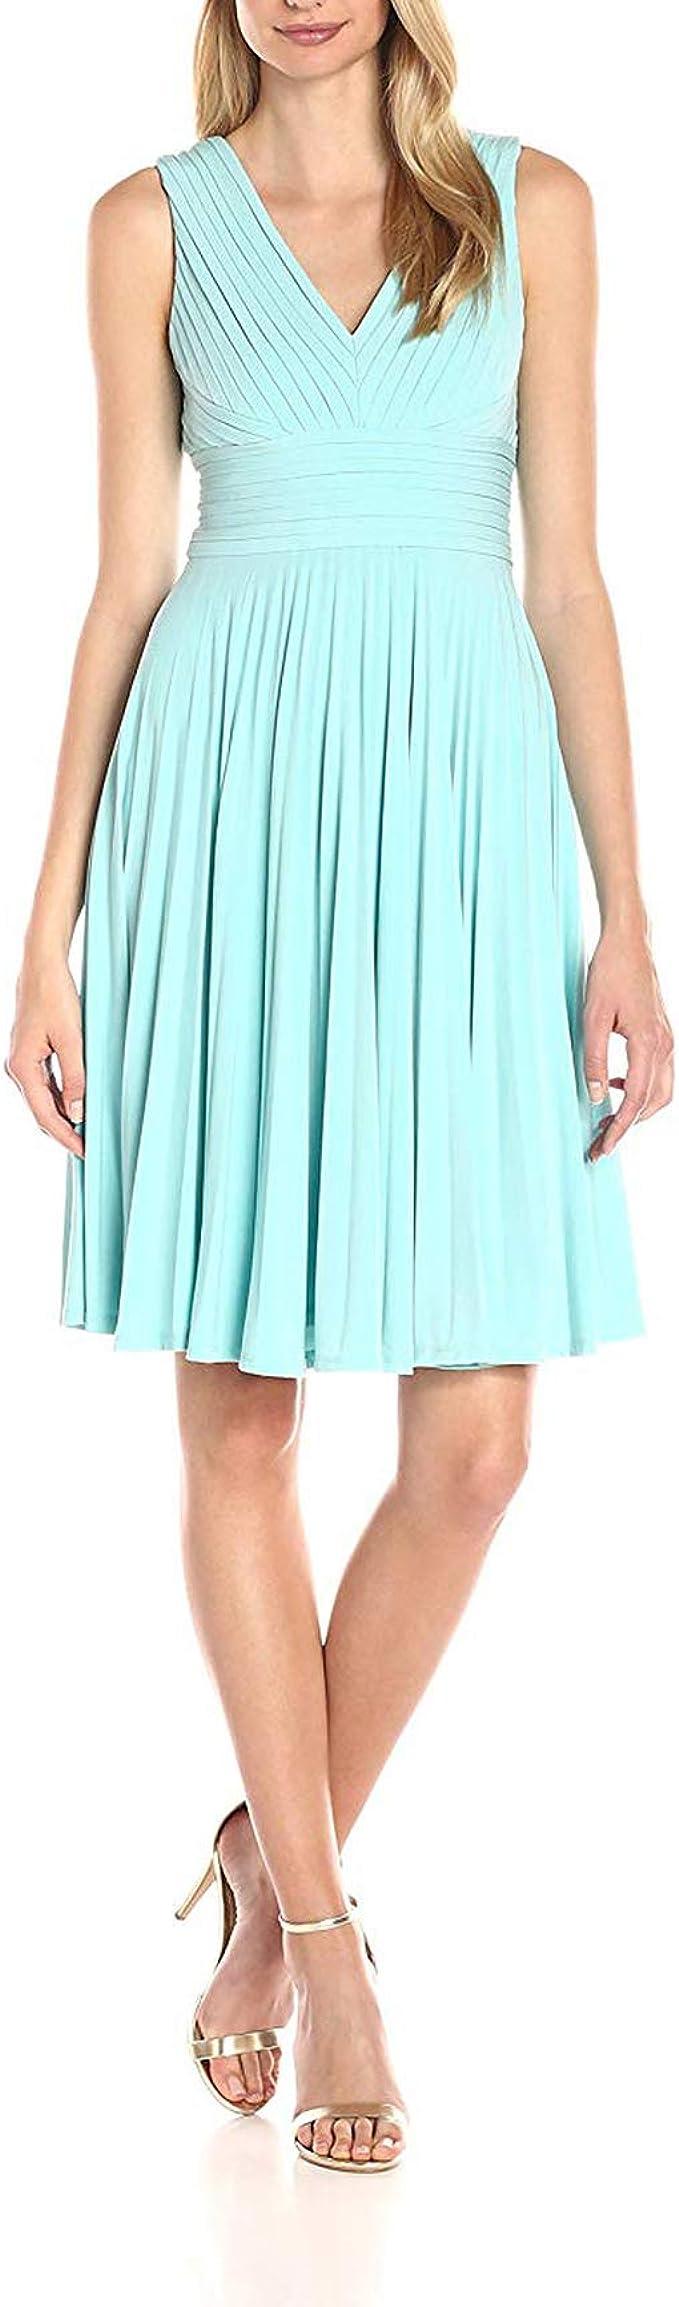 Fashion Elf Skirt Vestido Plisado con Falda de Elfo de Moda para ...